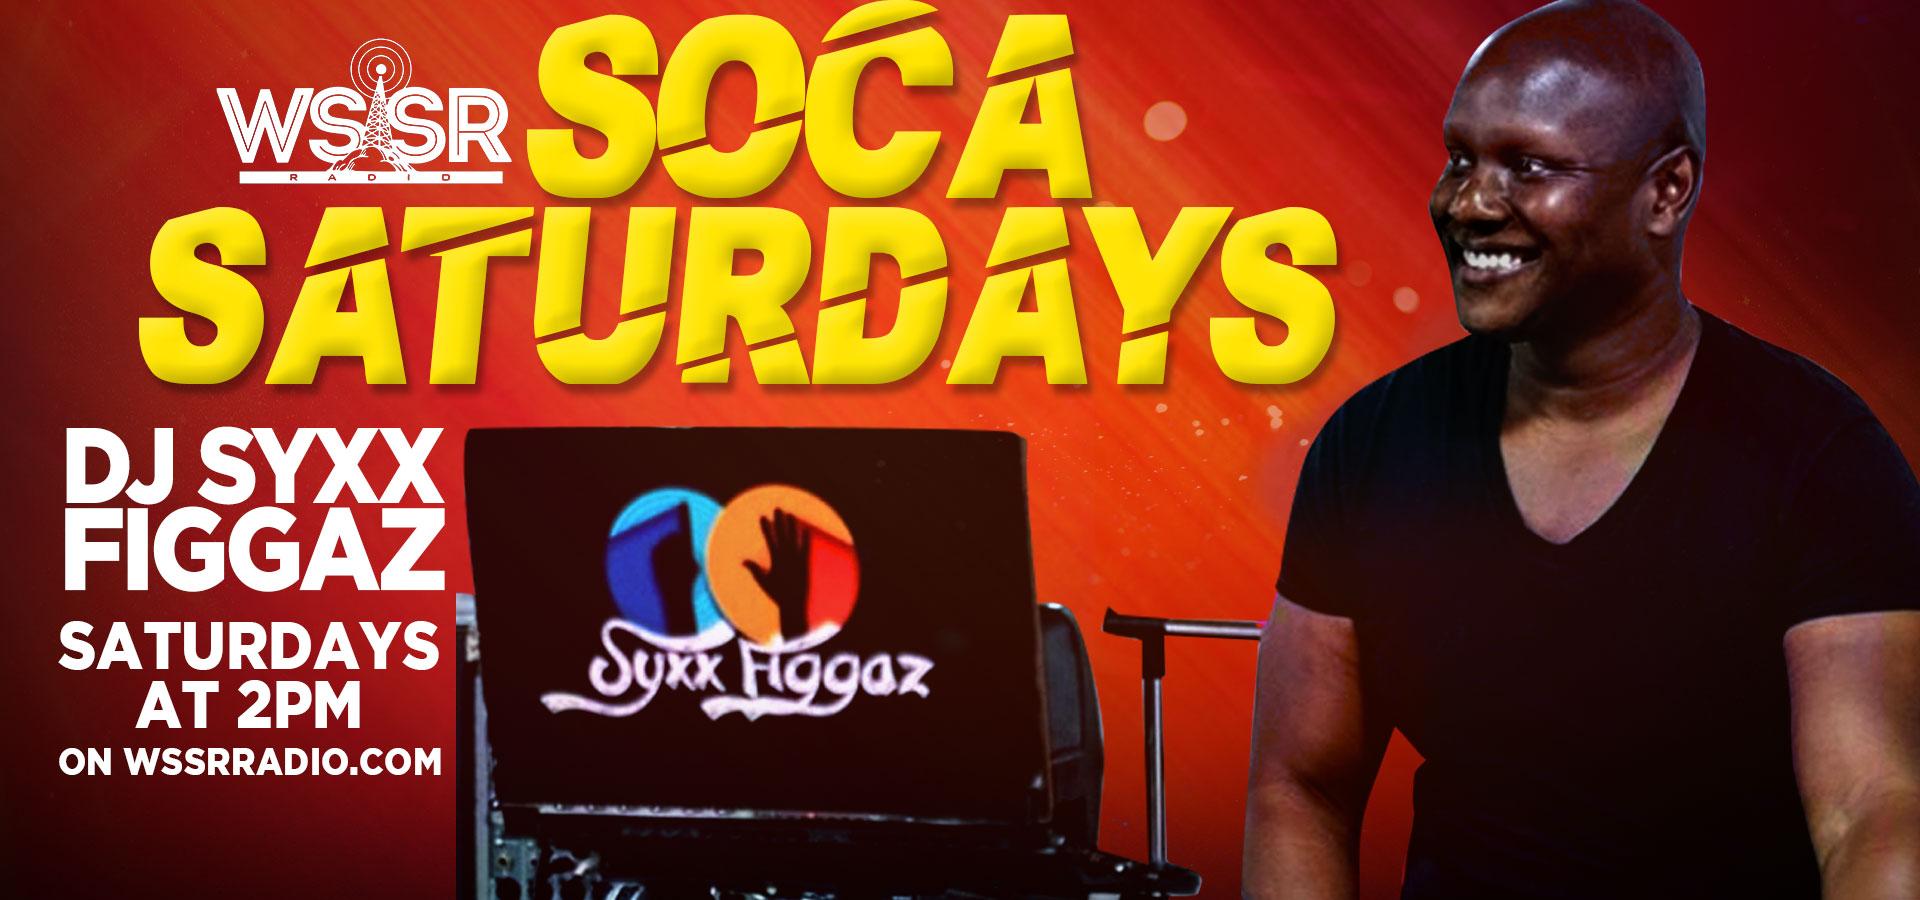 Soca Saturdays WB